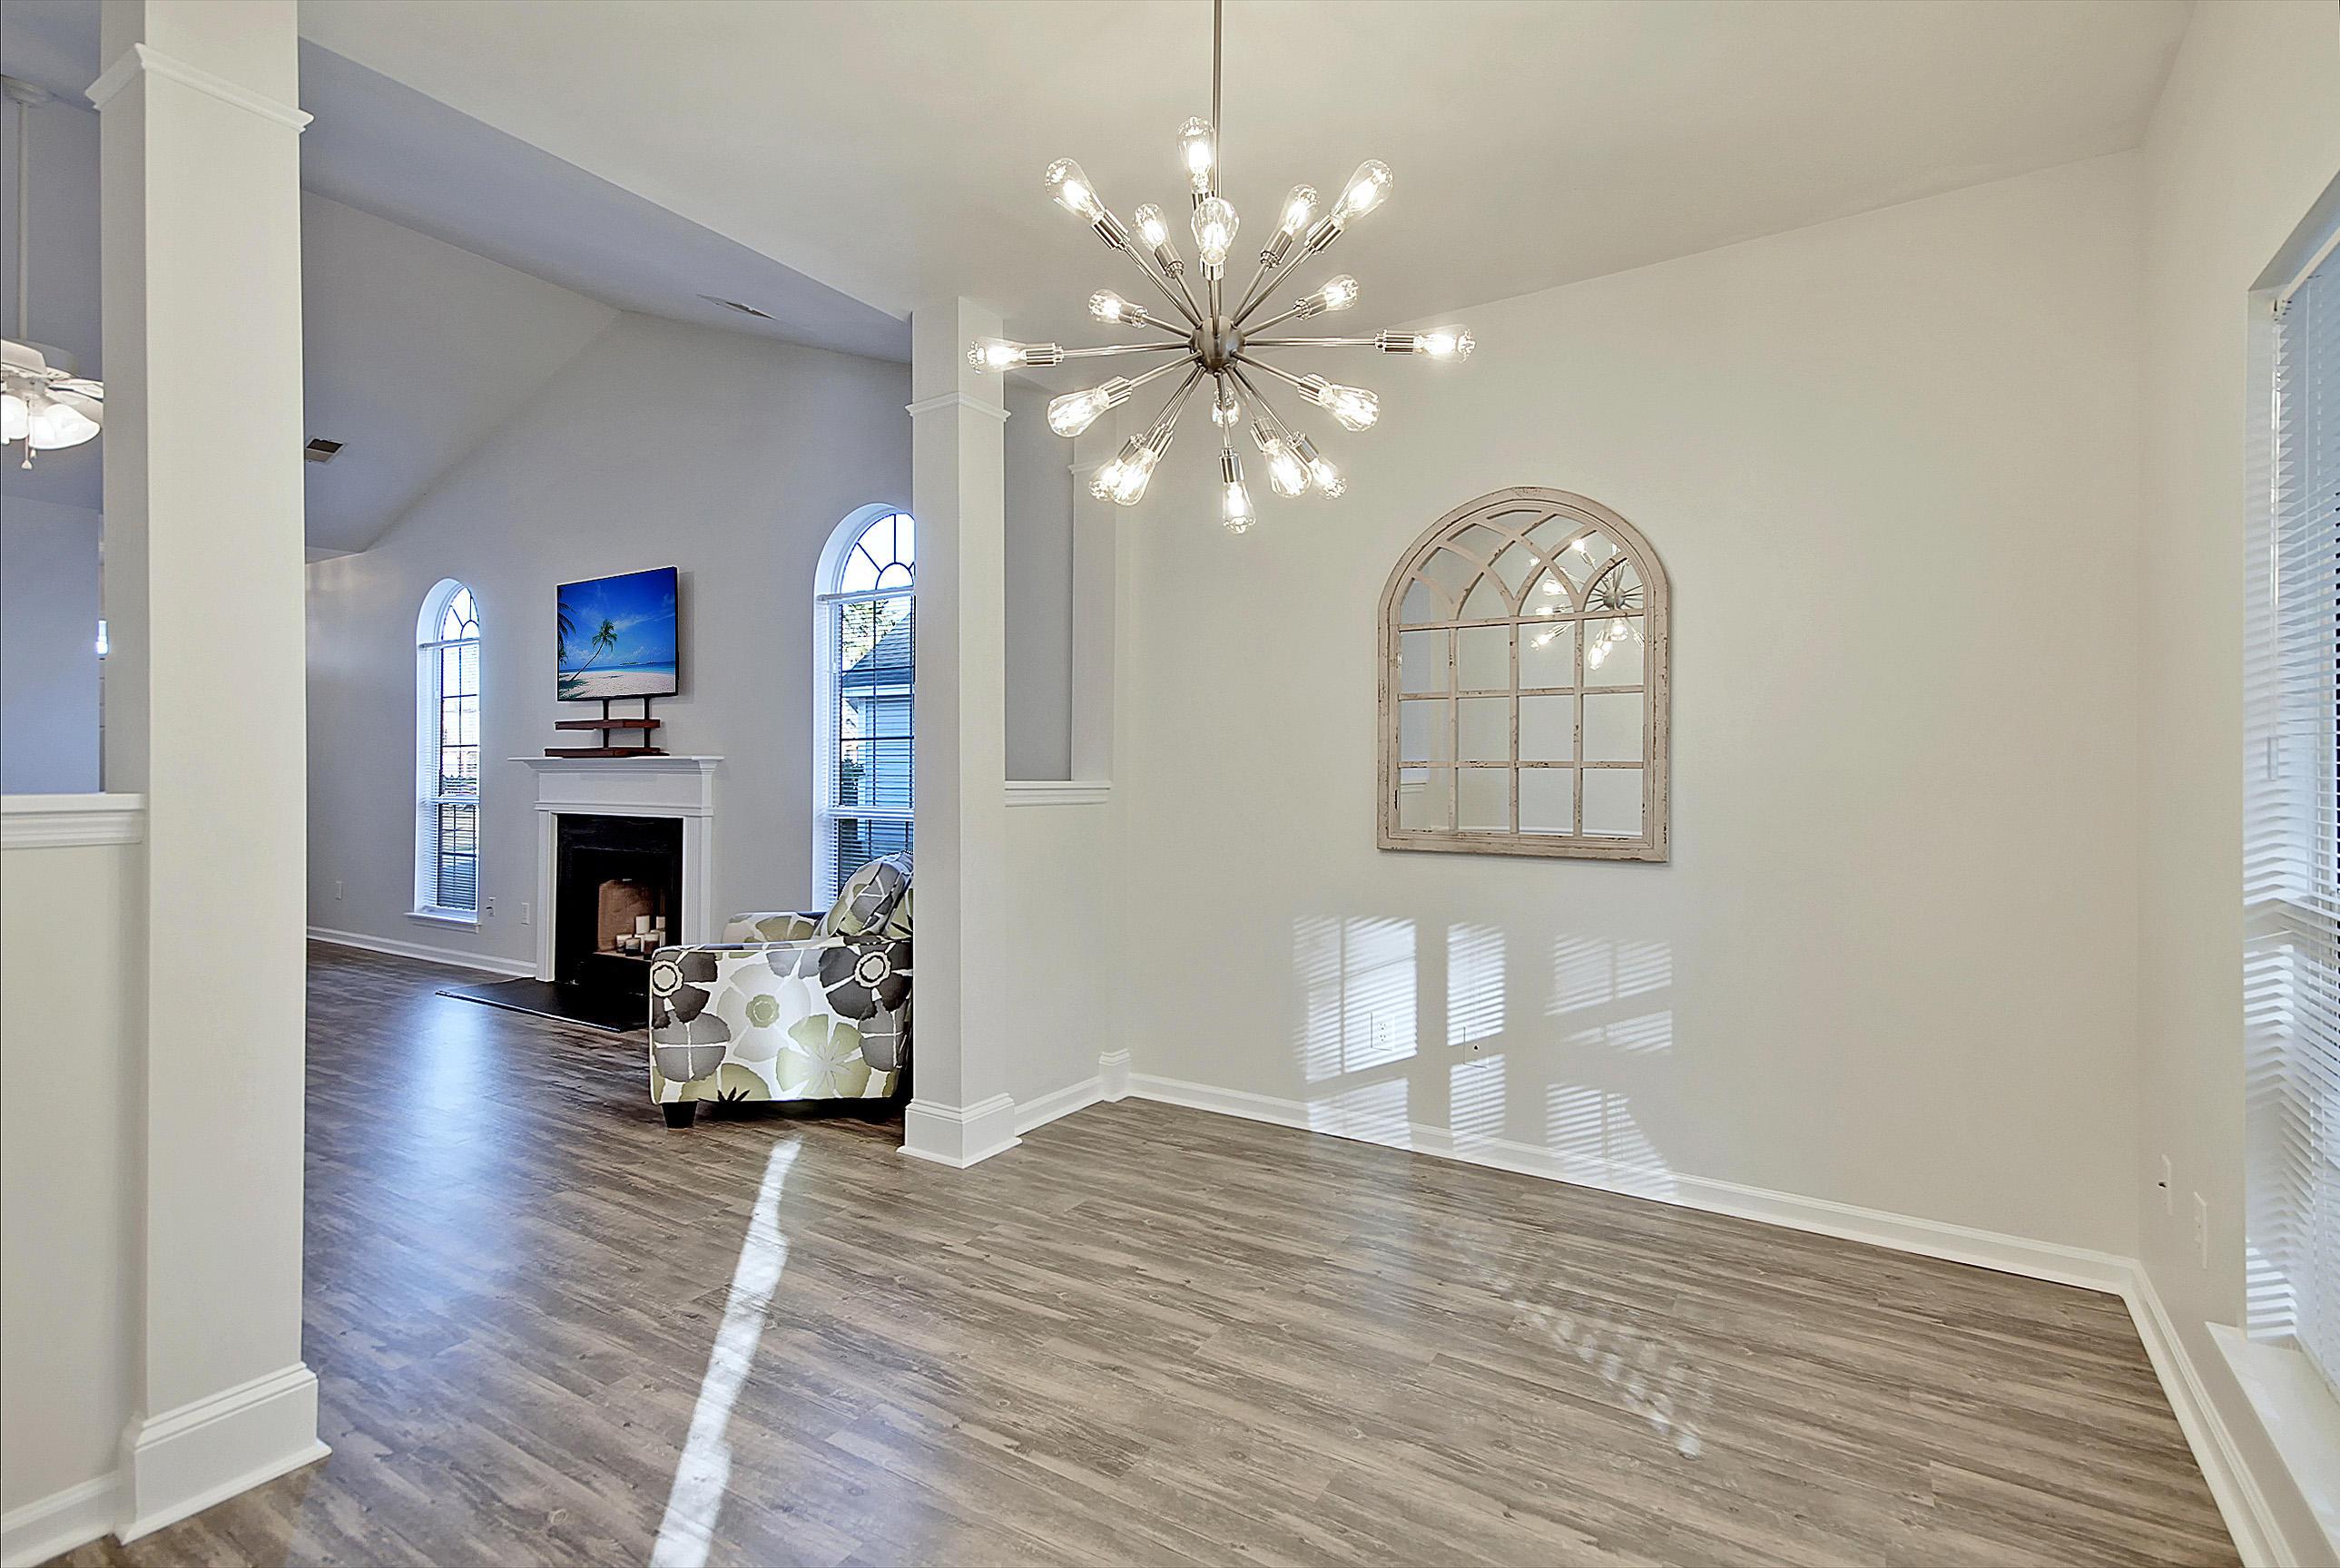 Dunes West Homes For Sale - 2656 Palmetto Hall, Mount Pleasant, SC - 30